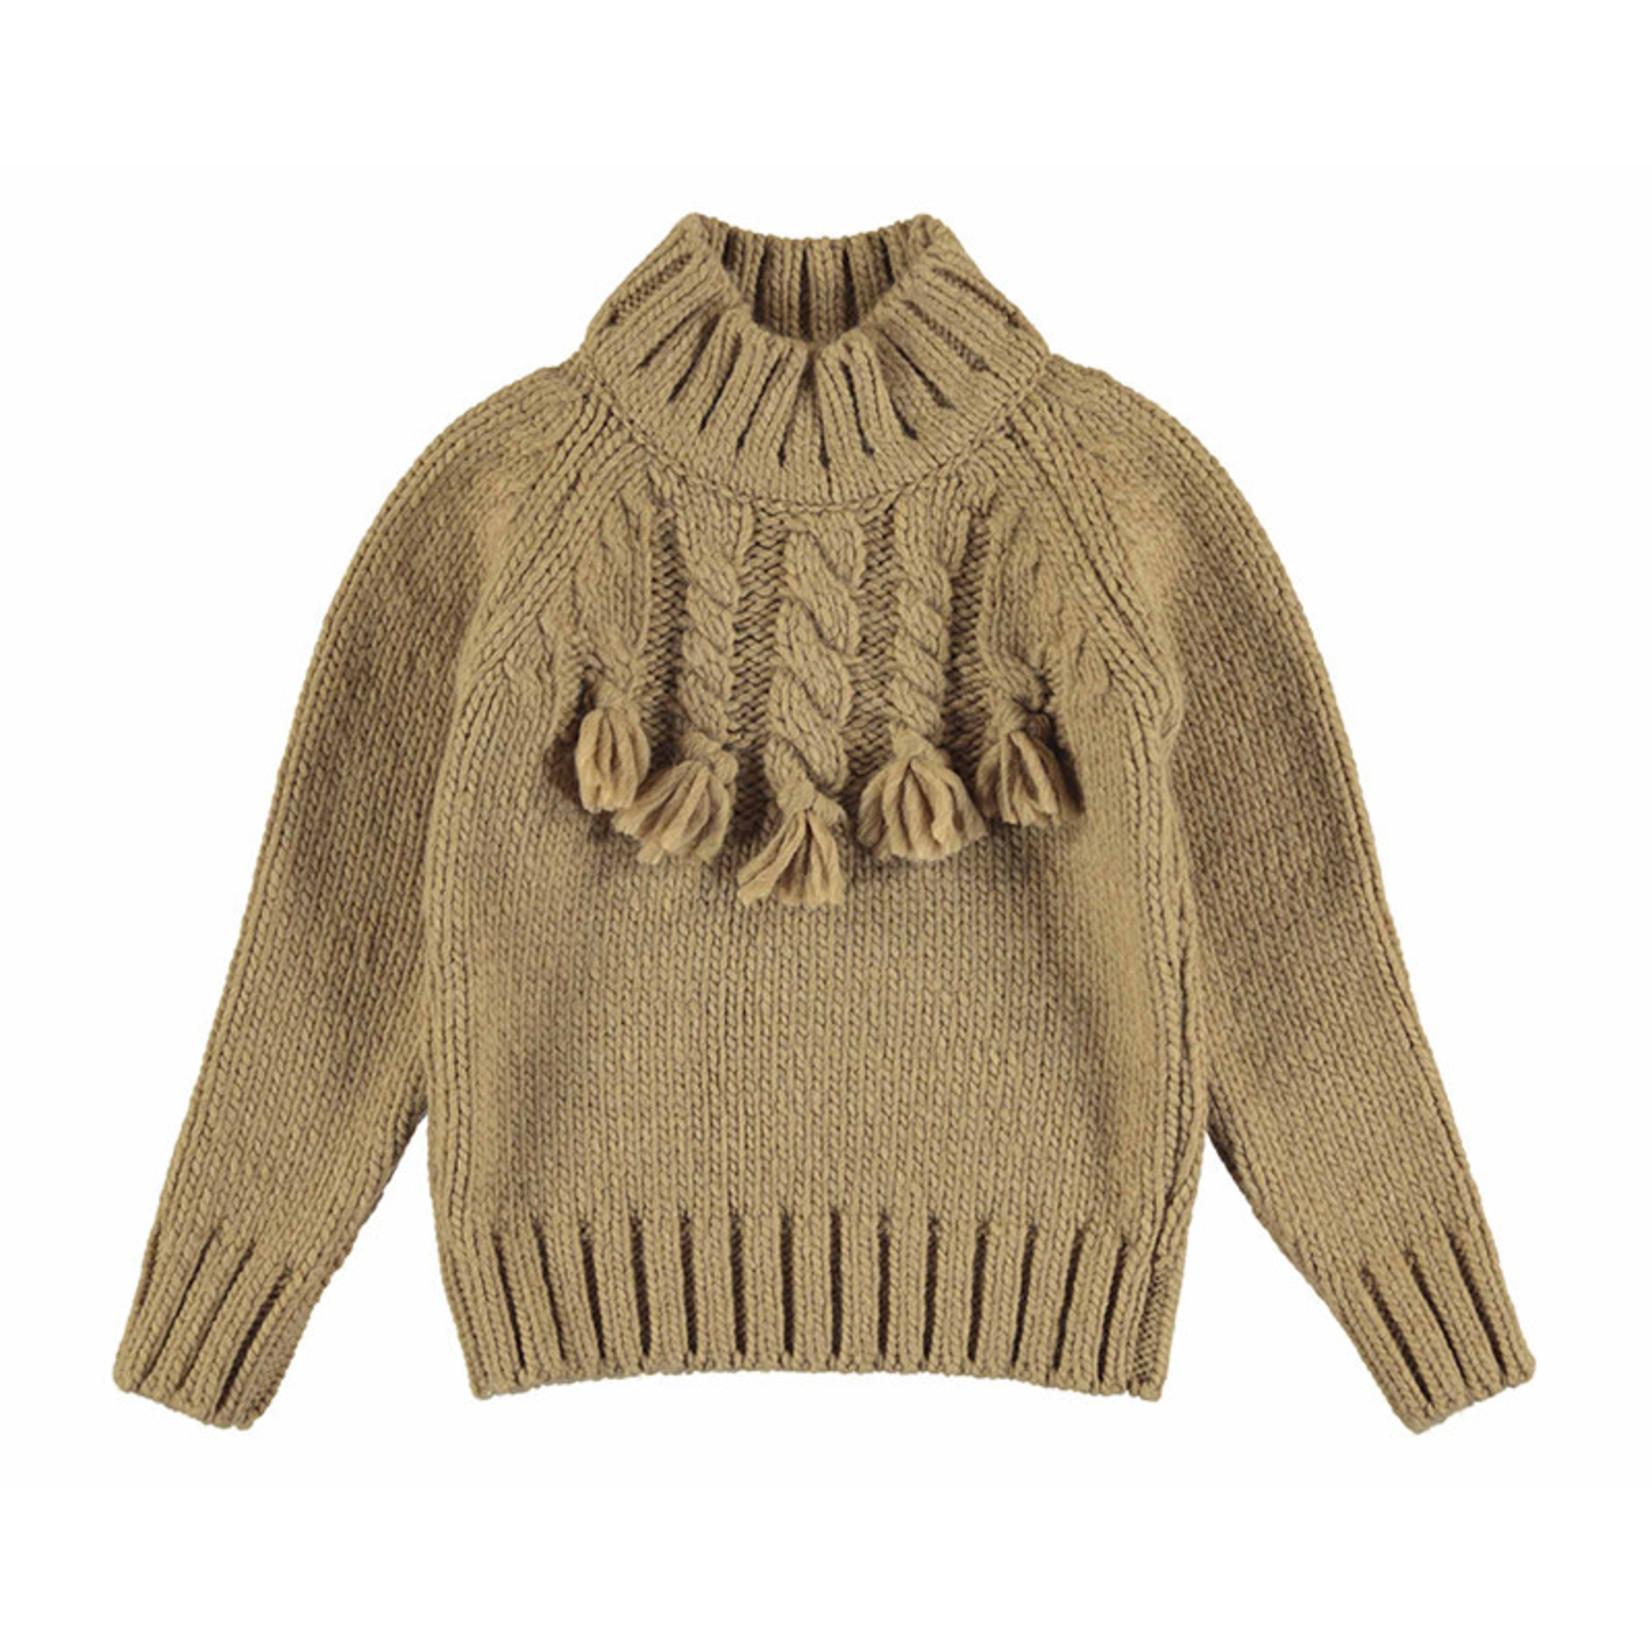 Camellia Sweater Braided Hazelnut - Mayoral